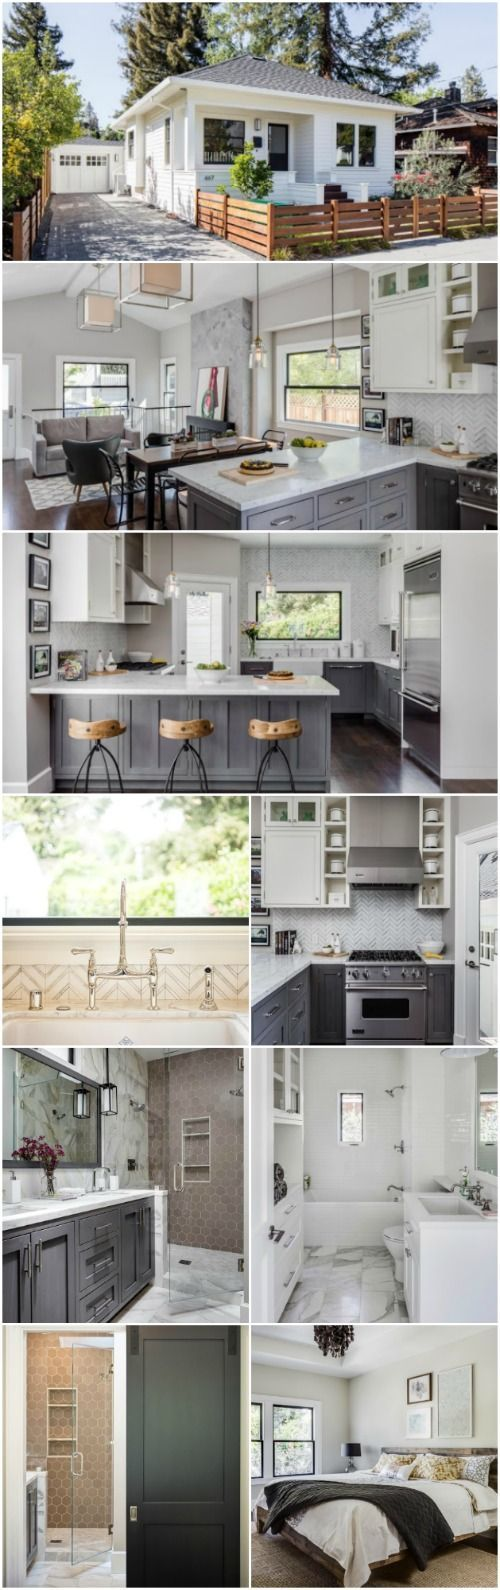 californian interior designer designs dreamy tiny house in napa valley